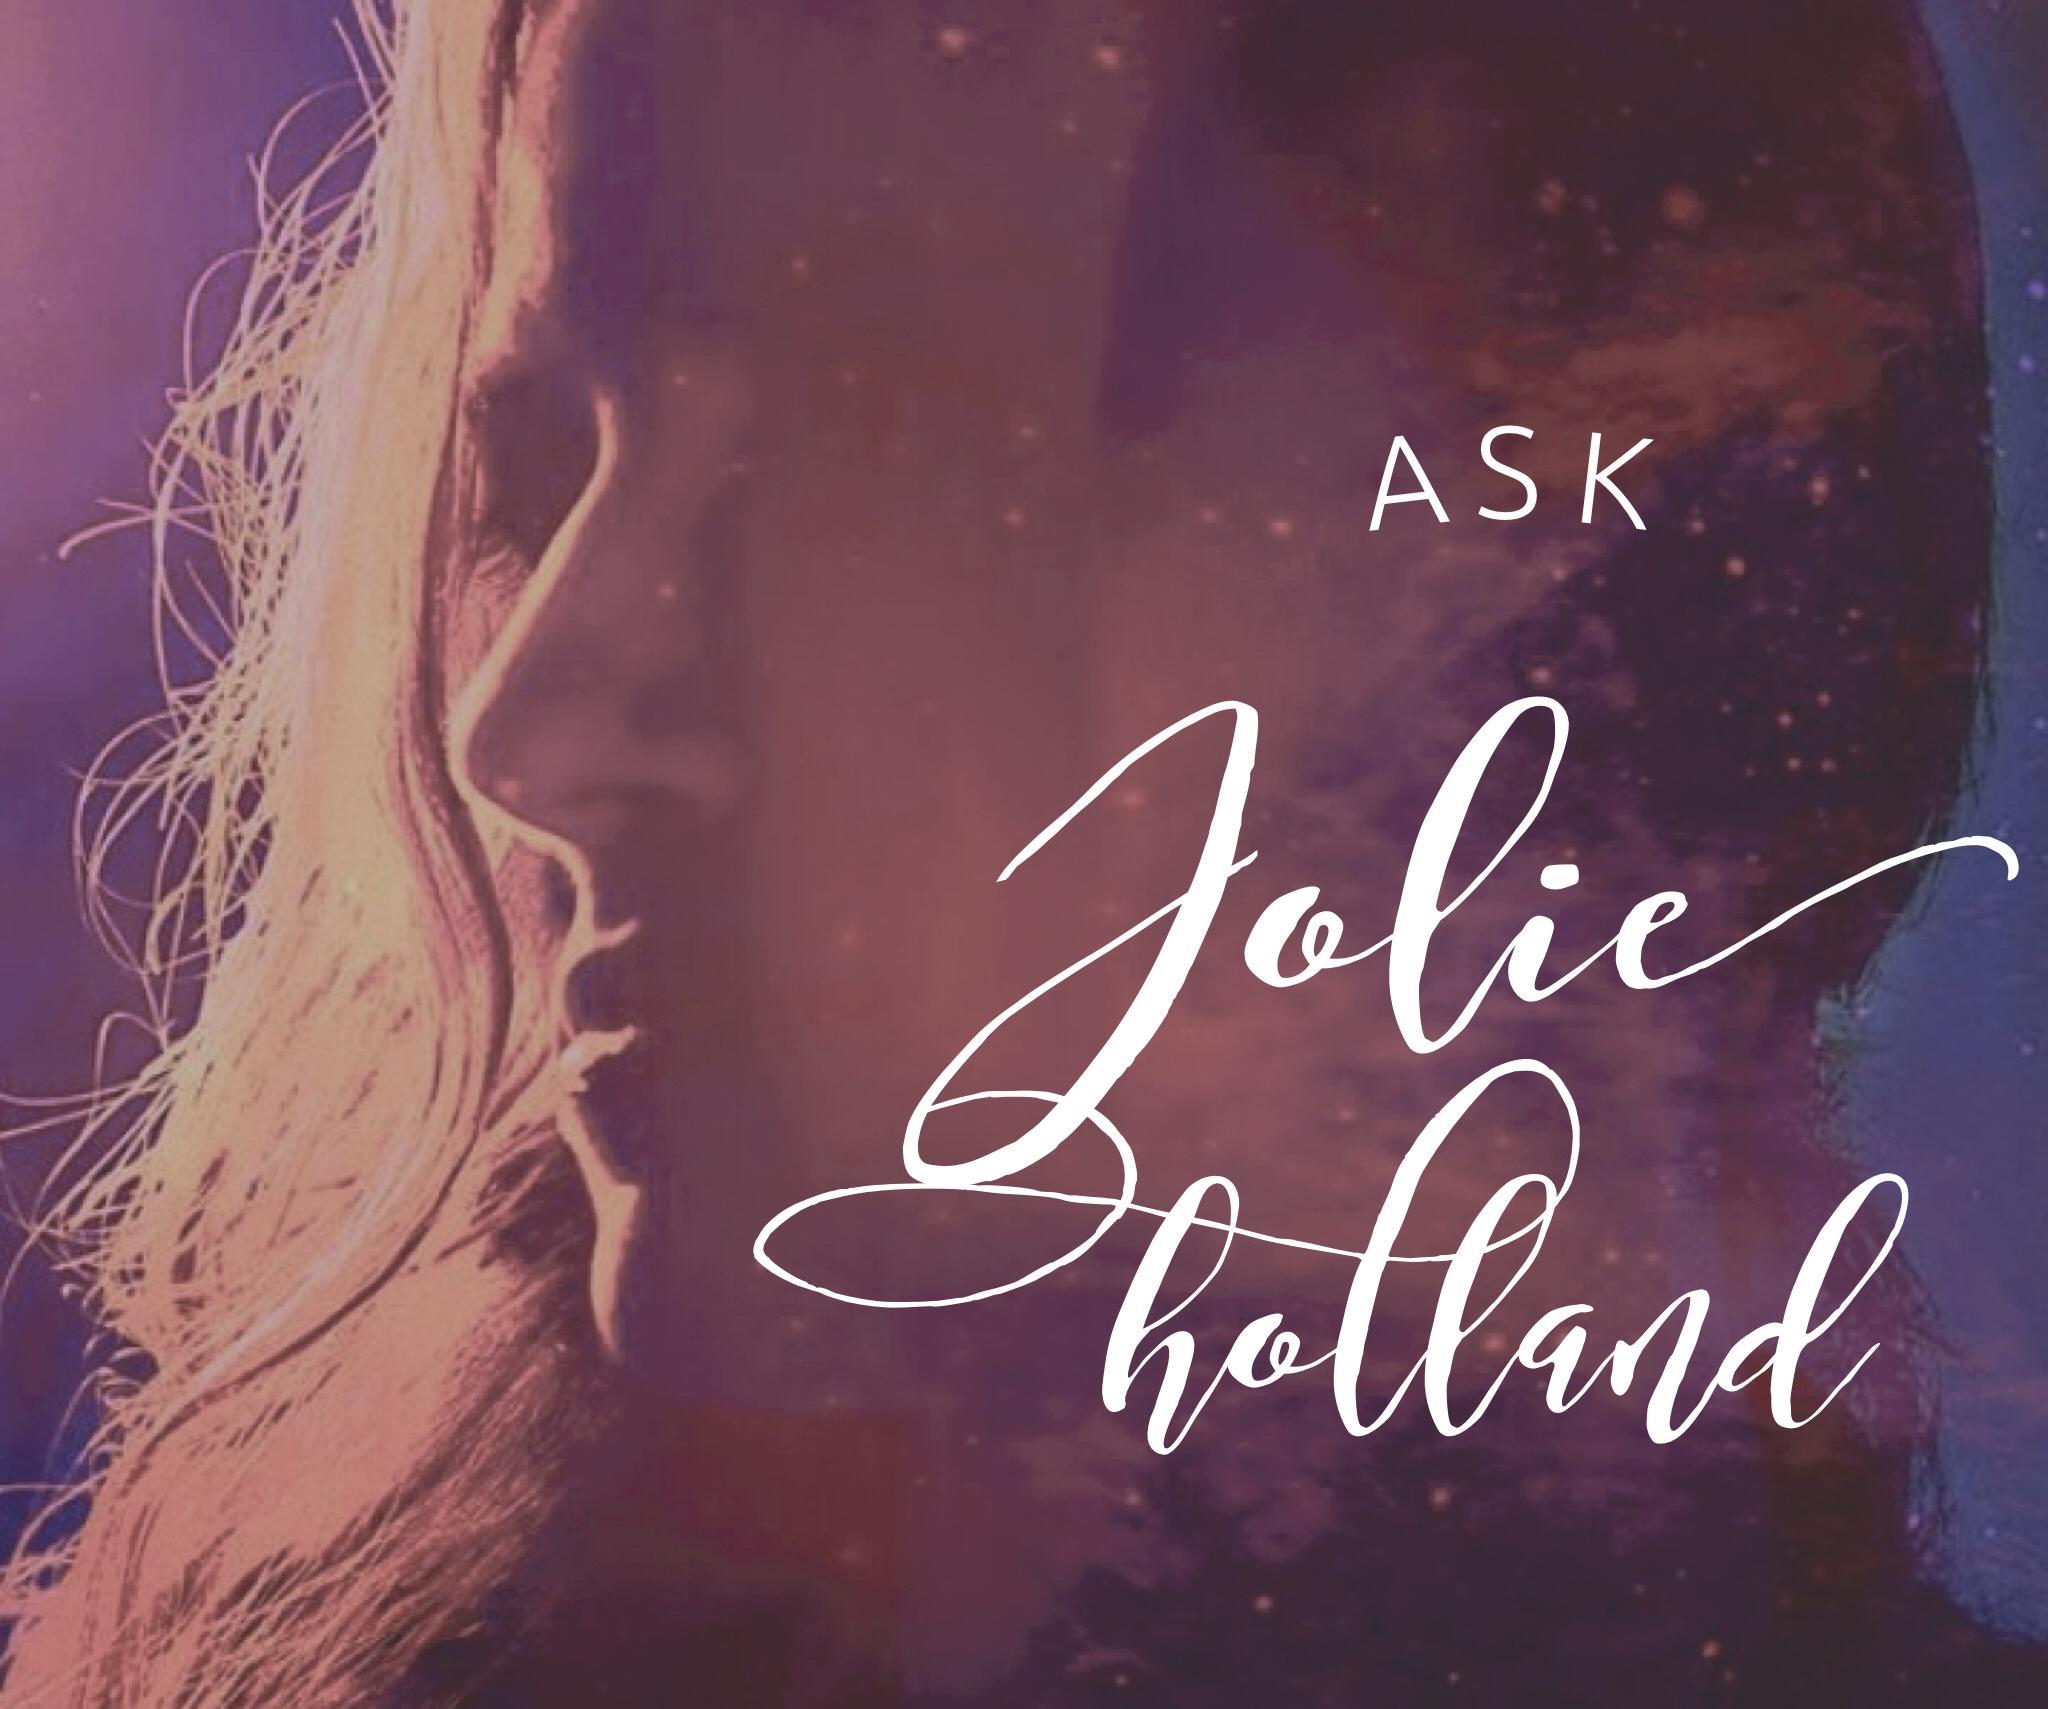 Ask Jolie Holland: Loving an Addict